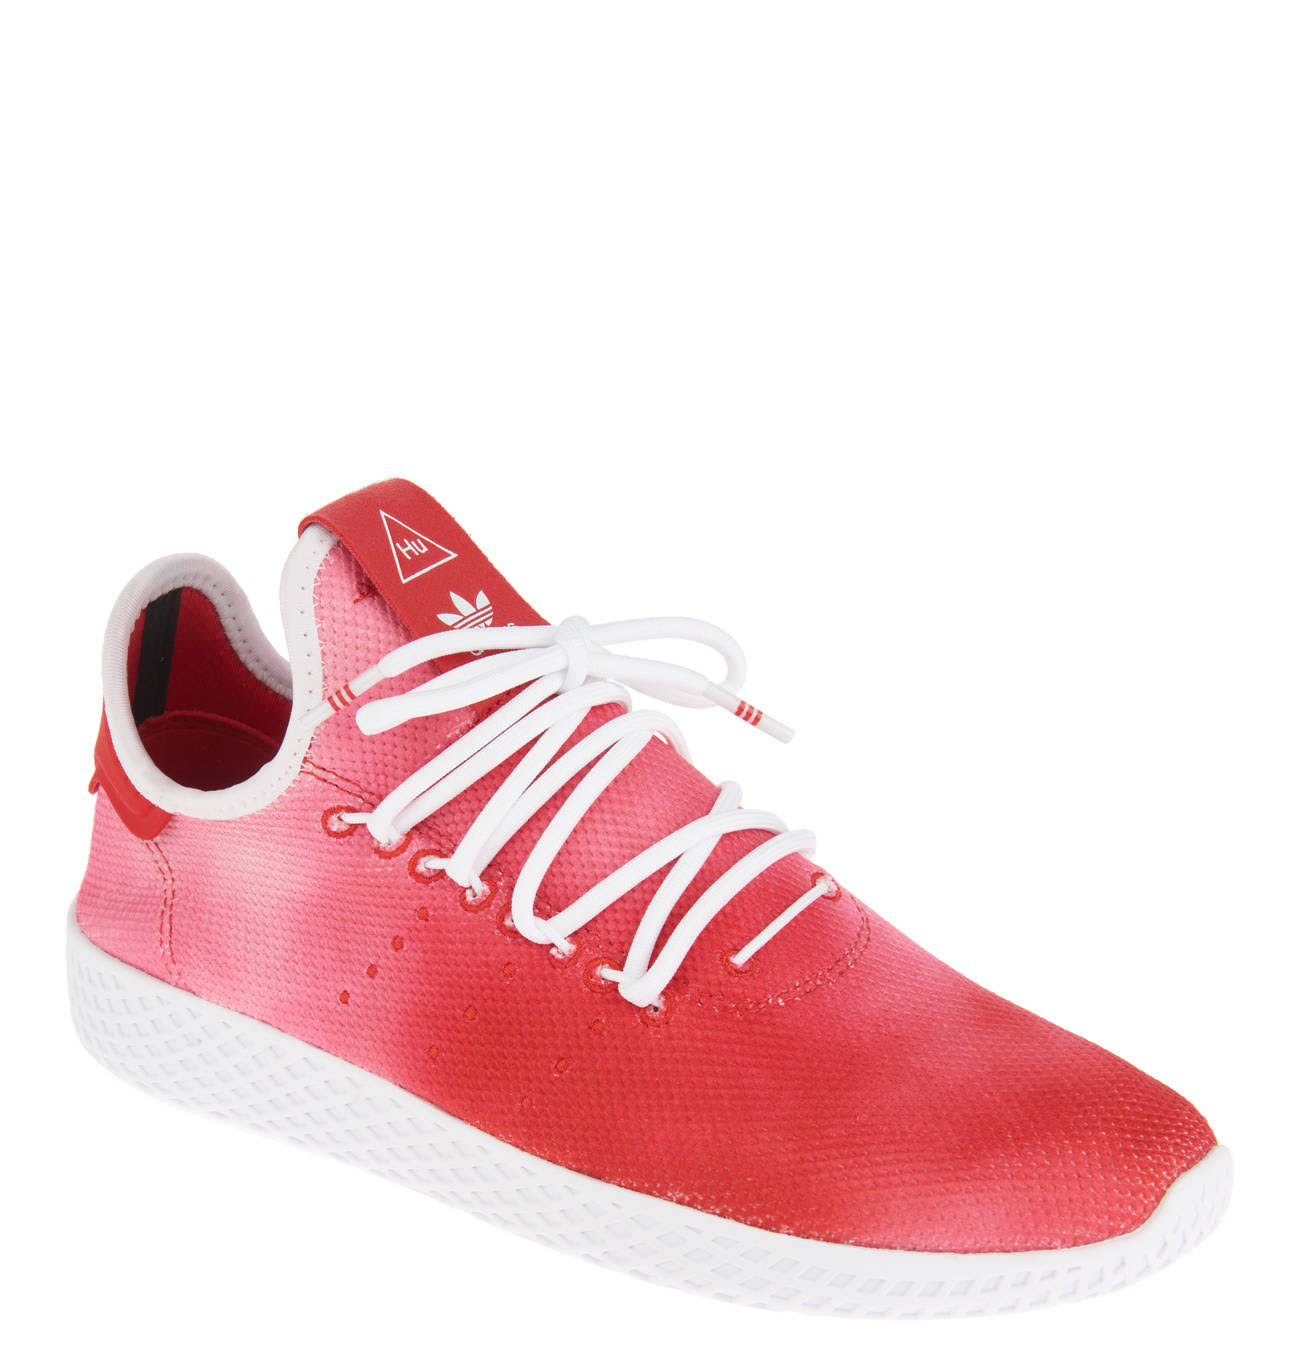 Größe Da9615 Tennis Rot Williams Pharrell Adidas Hu Schuhe 40 XqY7RnT